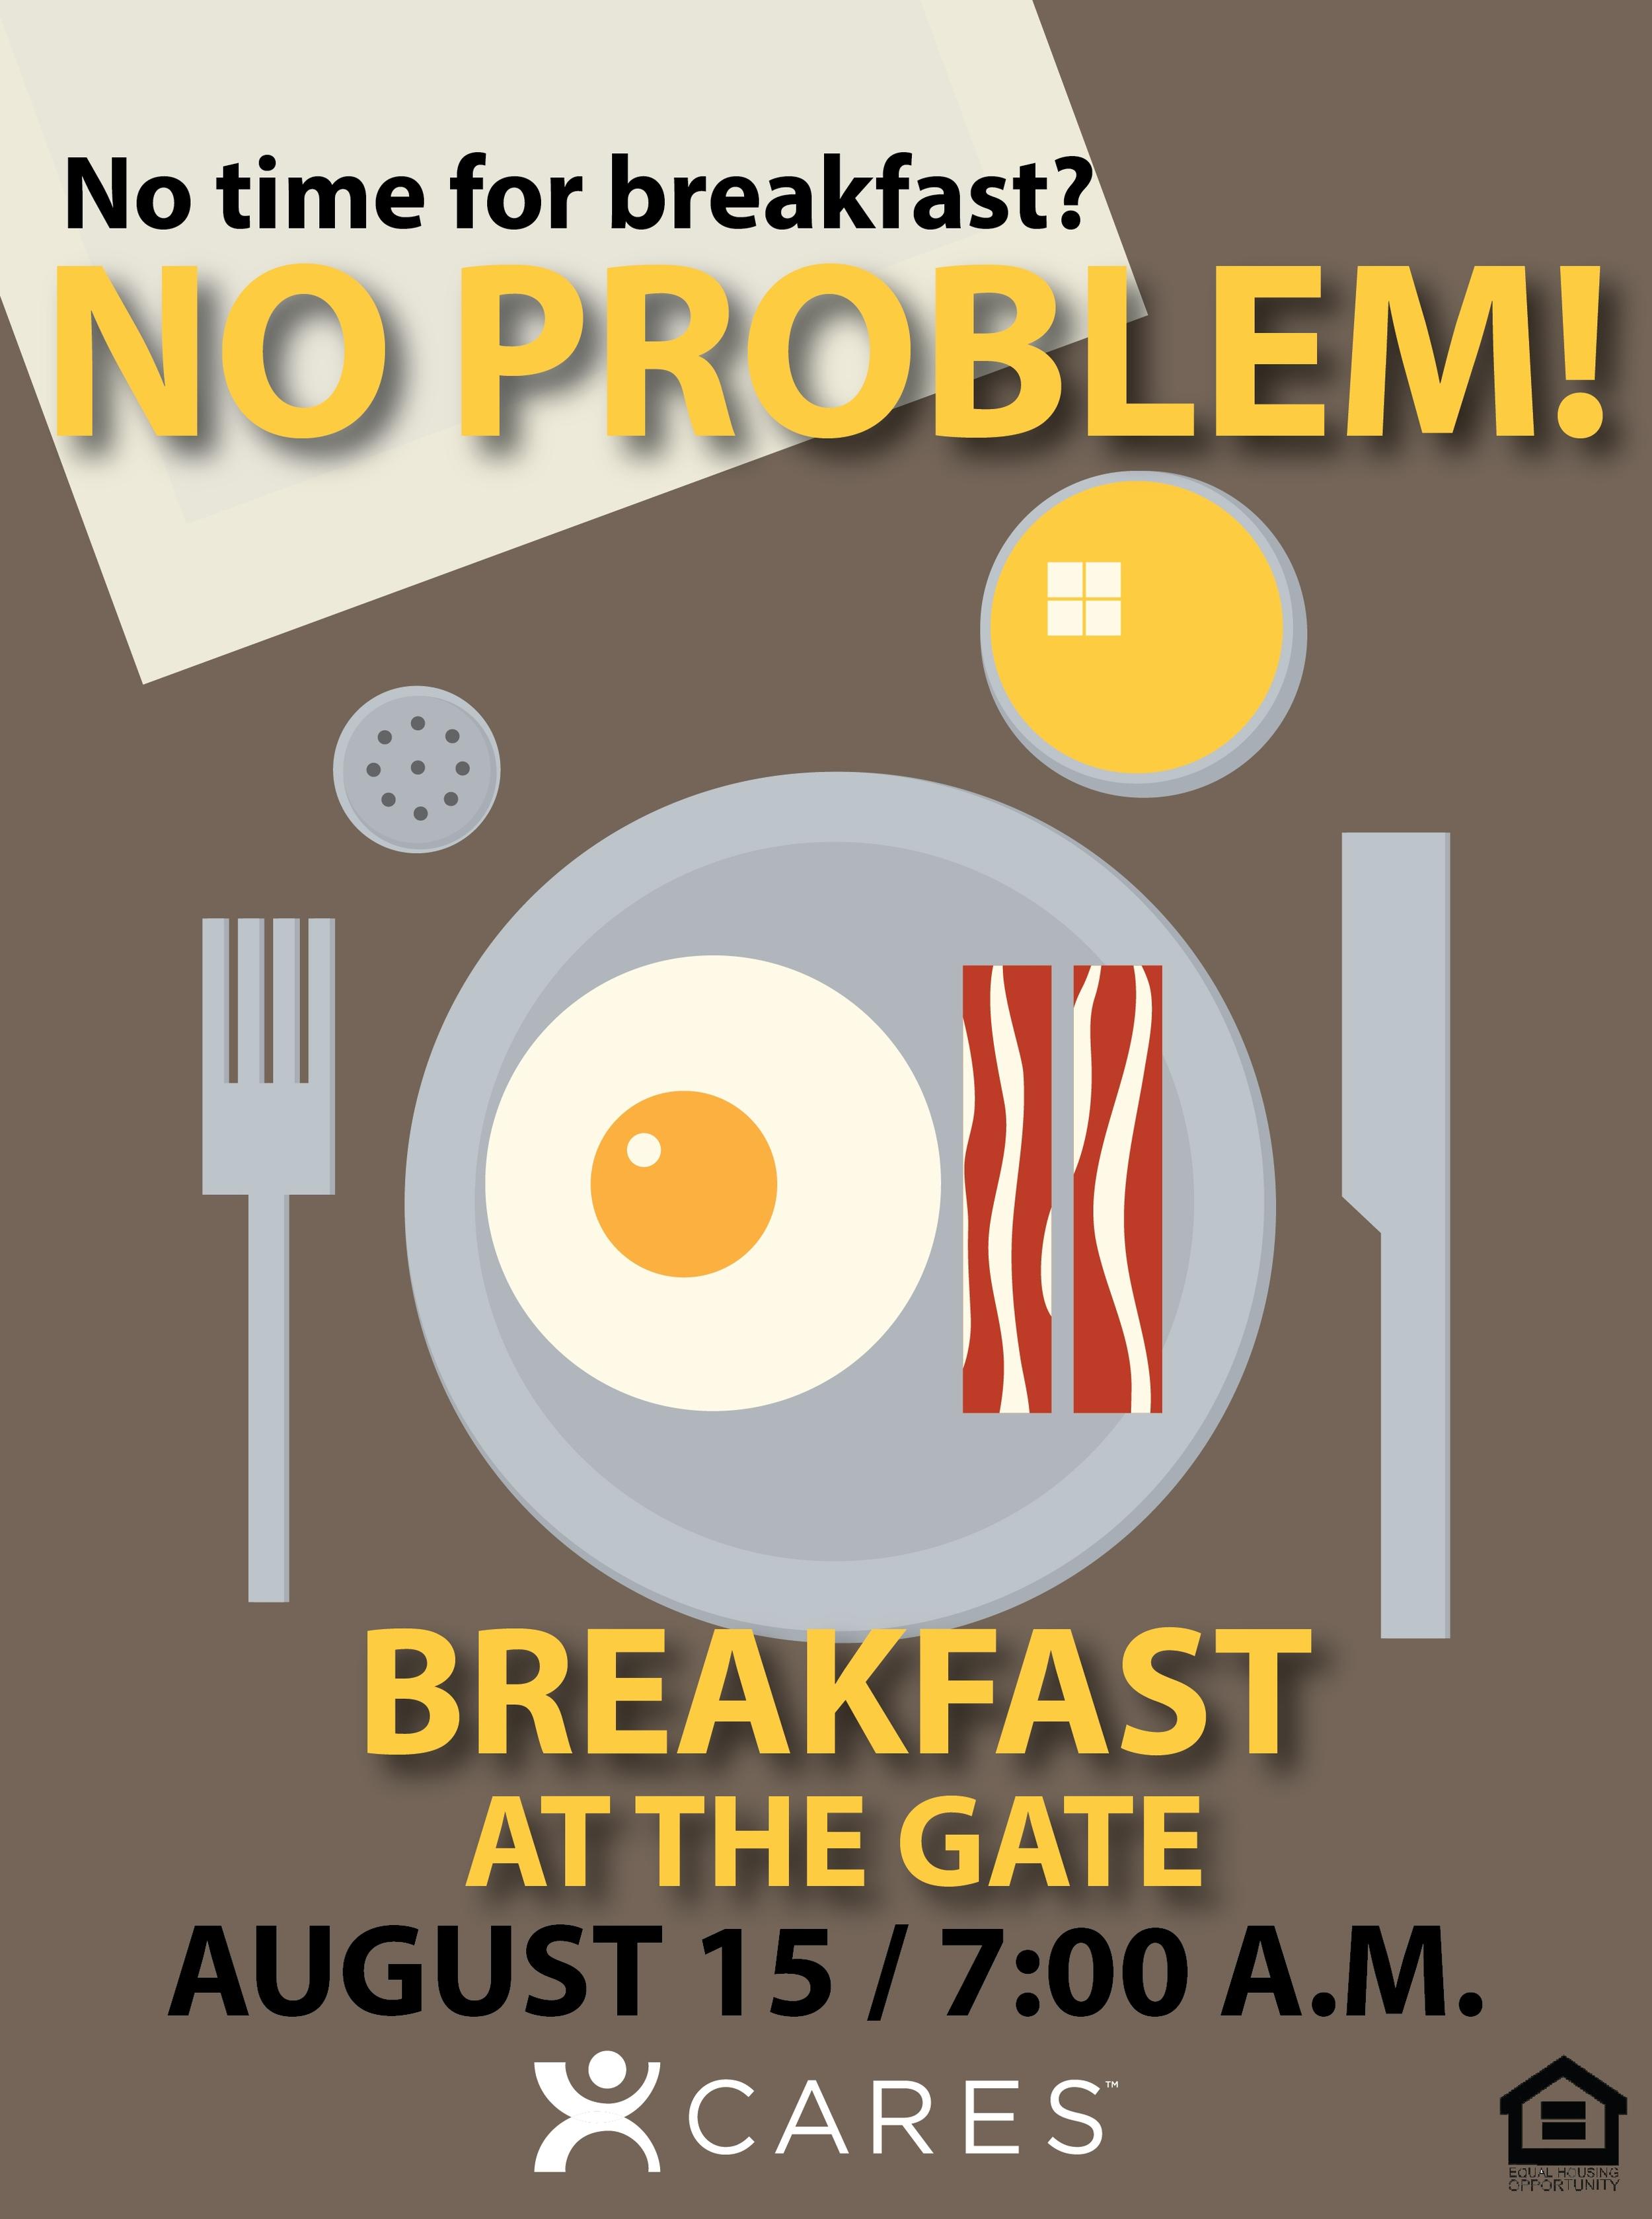 cares event staple breakfast on the go apartment life idea blog